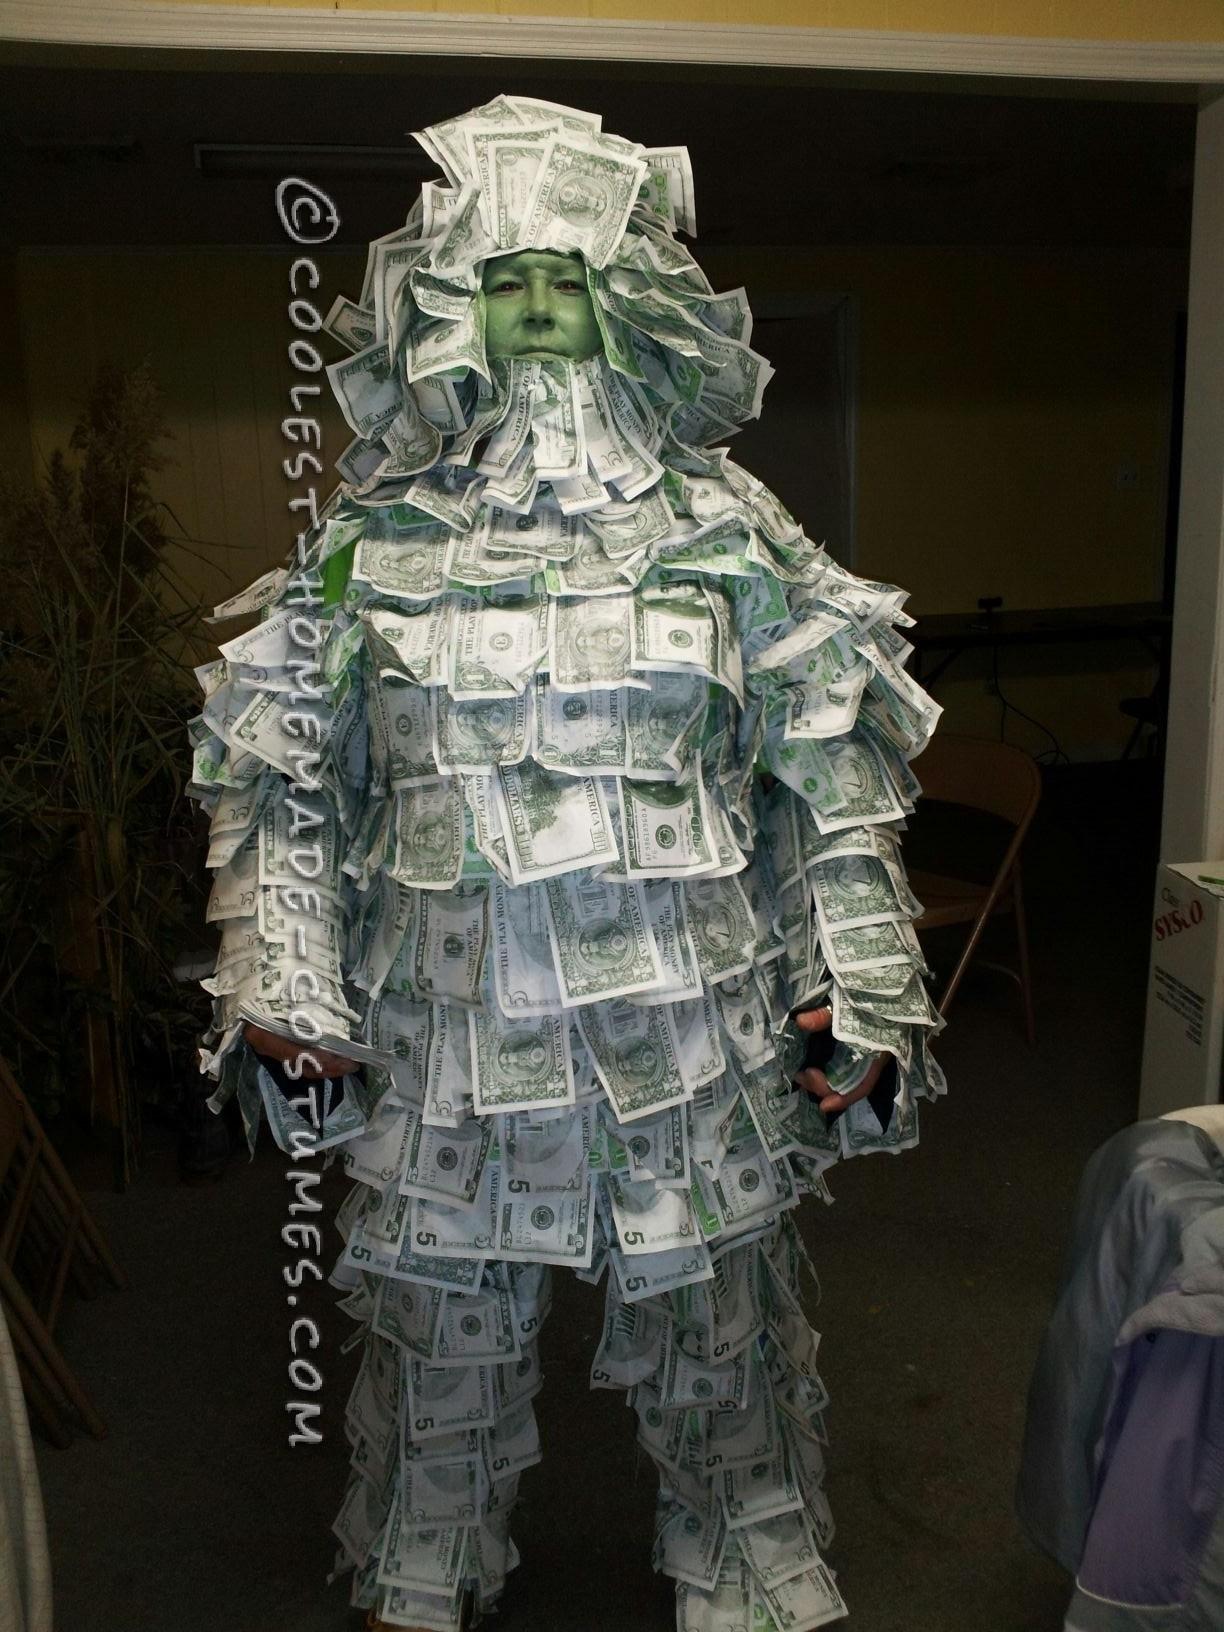 Awesome Homemade Geico Money Man Costume